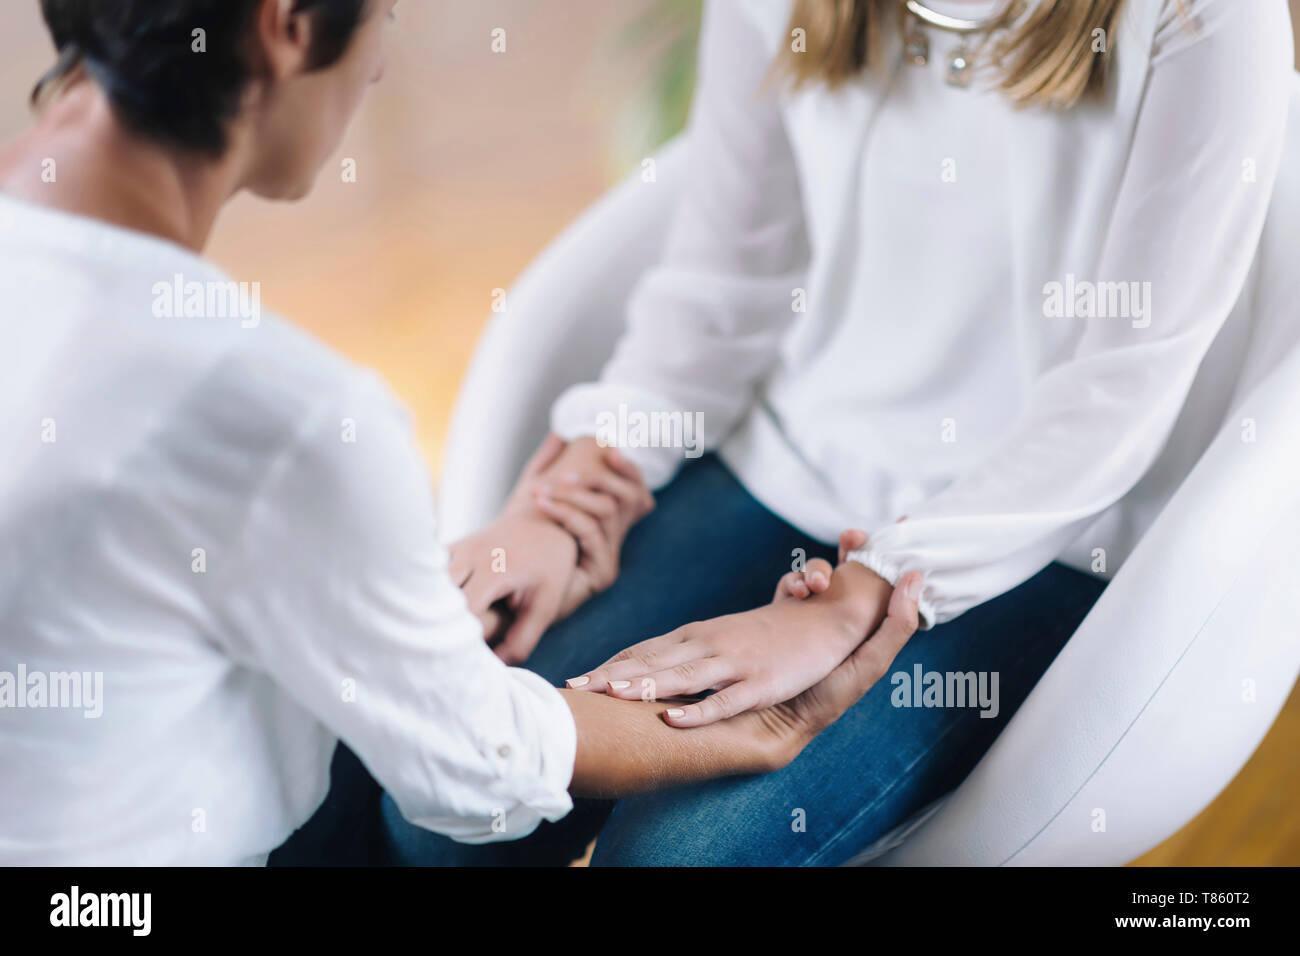 Theta healing therapy - Stock Image